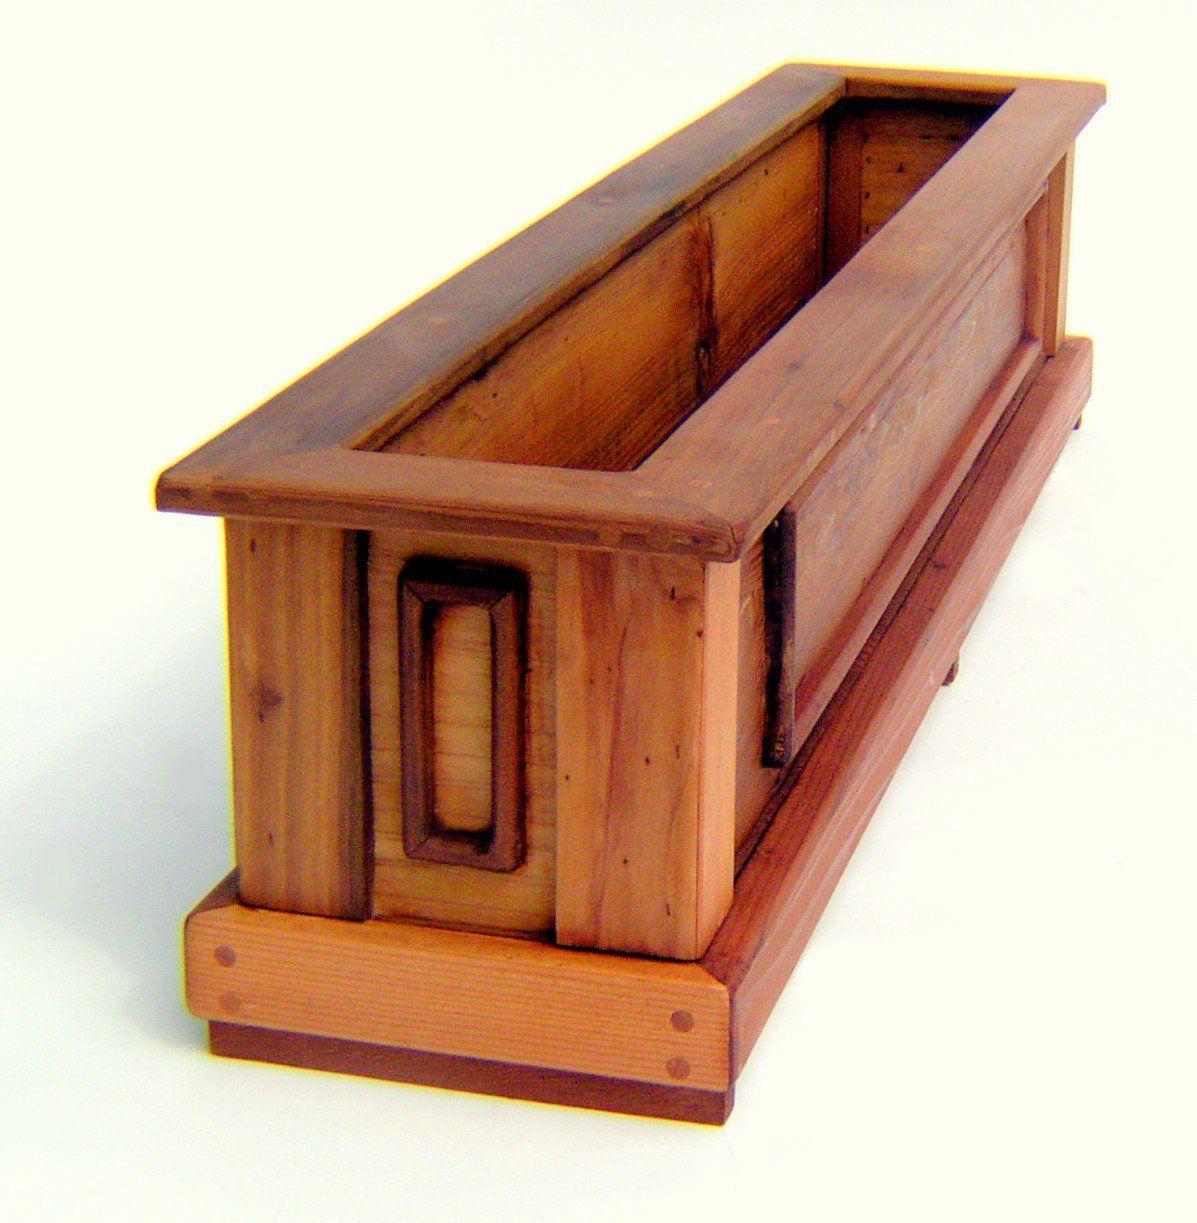 "Carmel Box Planter (Options: 36"" L, 7.5"" W, 9"" H, Mature Redwood, 3/4"" Feet, No Steel Hangers, No fit over railings, No Growing Vegetables, Transparent Premium Sealant)."